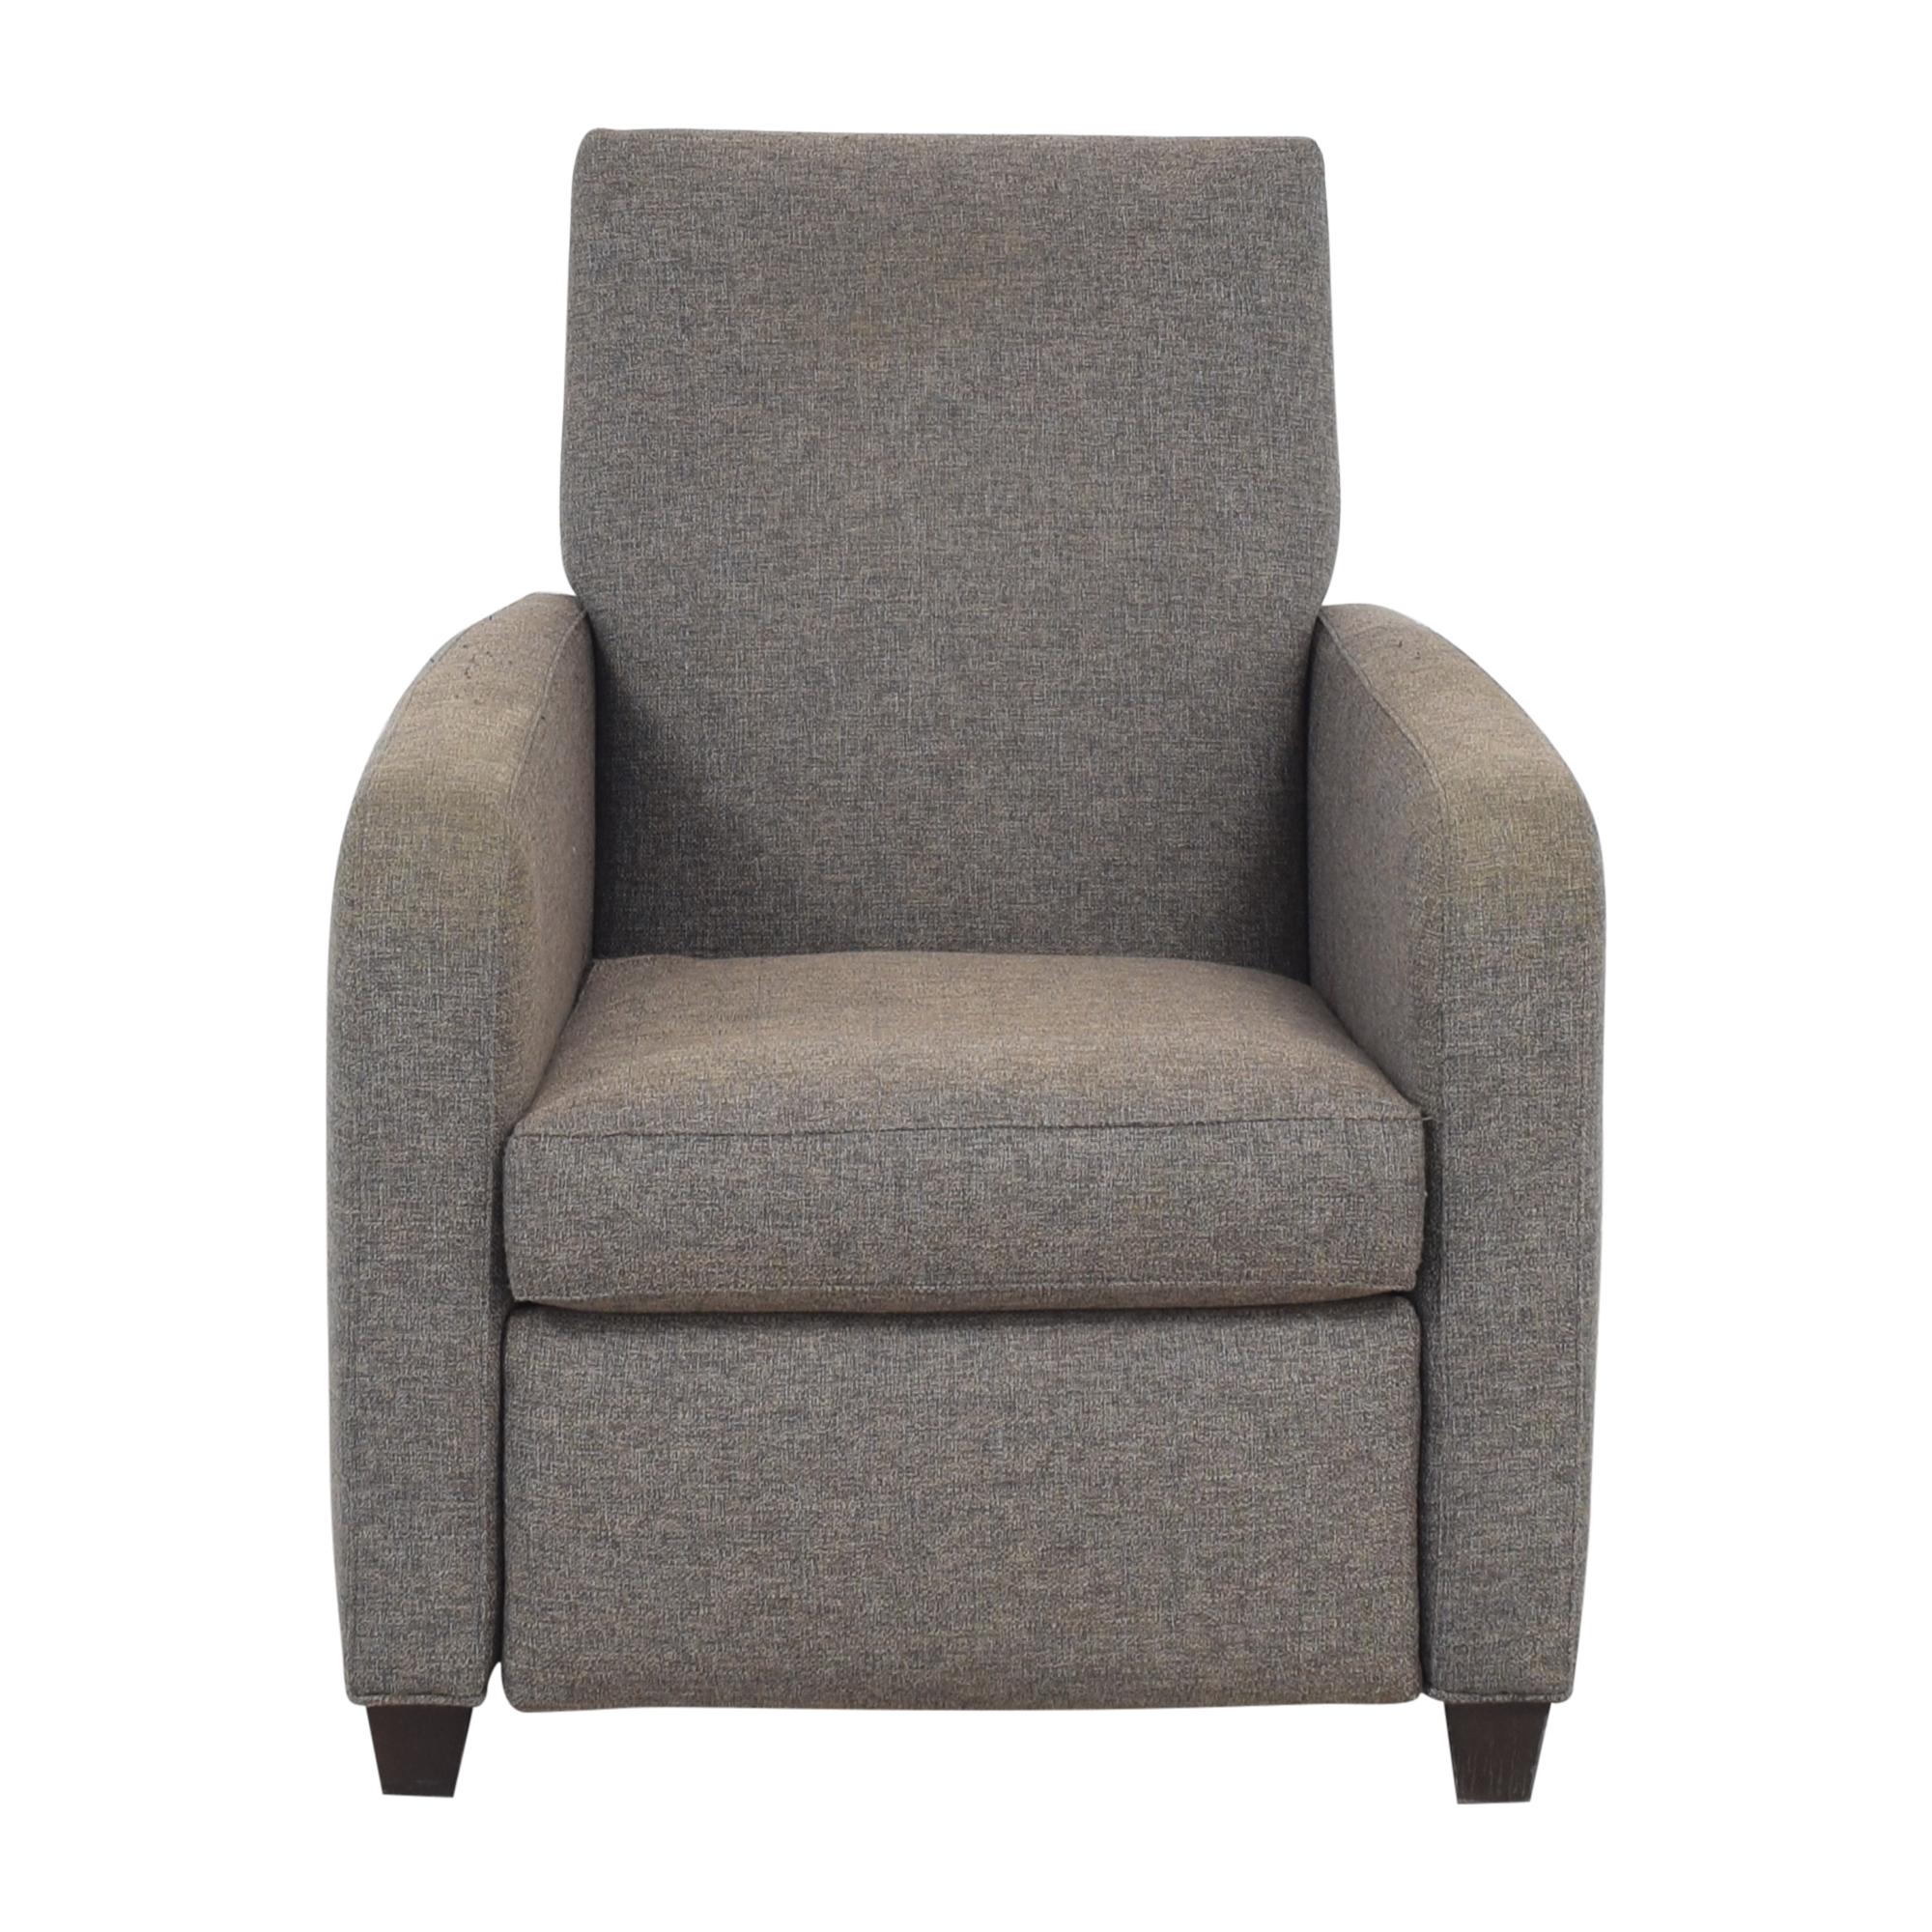 buy Crate & Barrel Royce Recliner Crate & Barrel Chairs